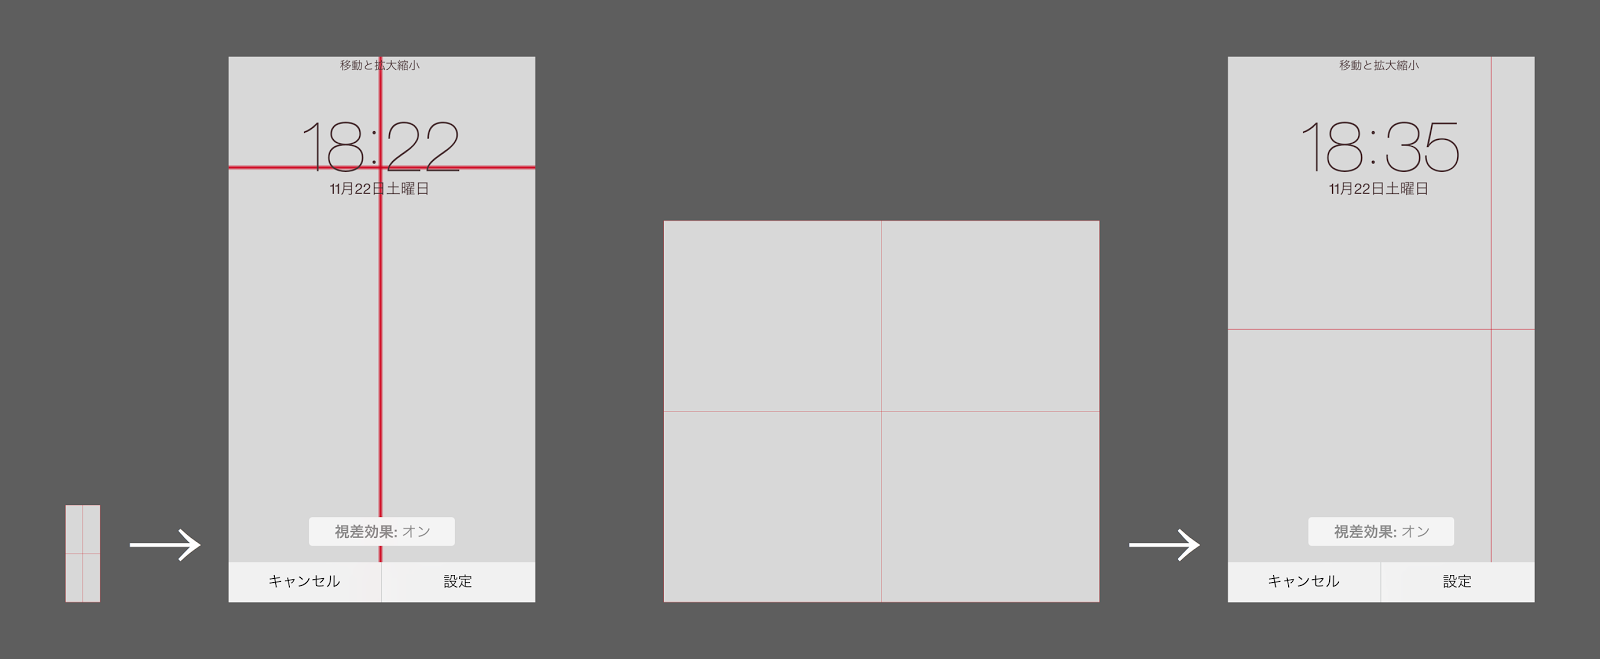 Iphoneの壁紙で移動と拡大縮小をしない場合は 不思議なiphone壁紙